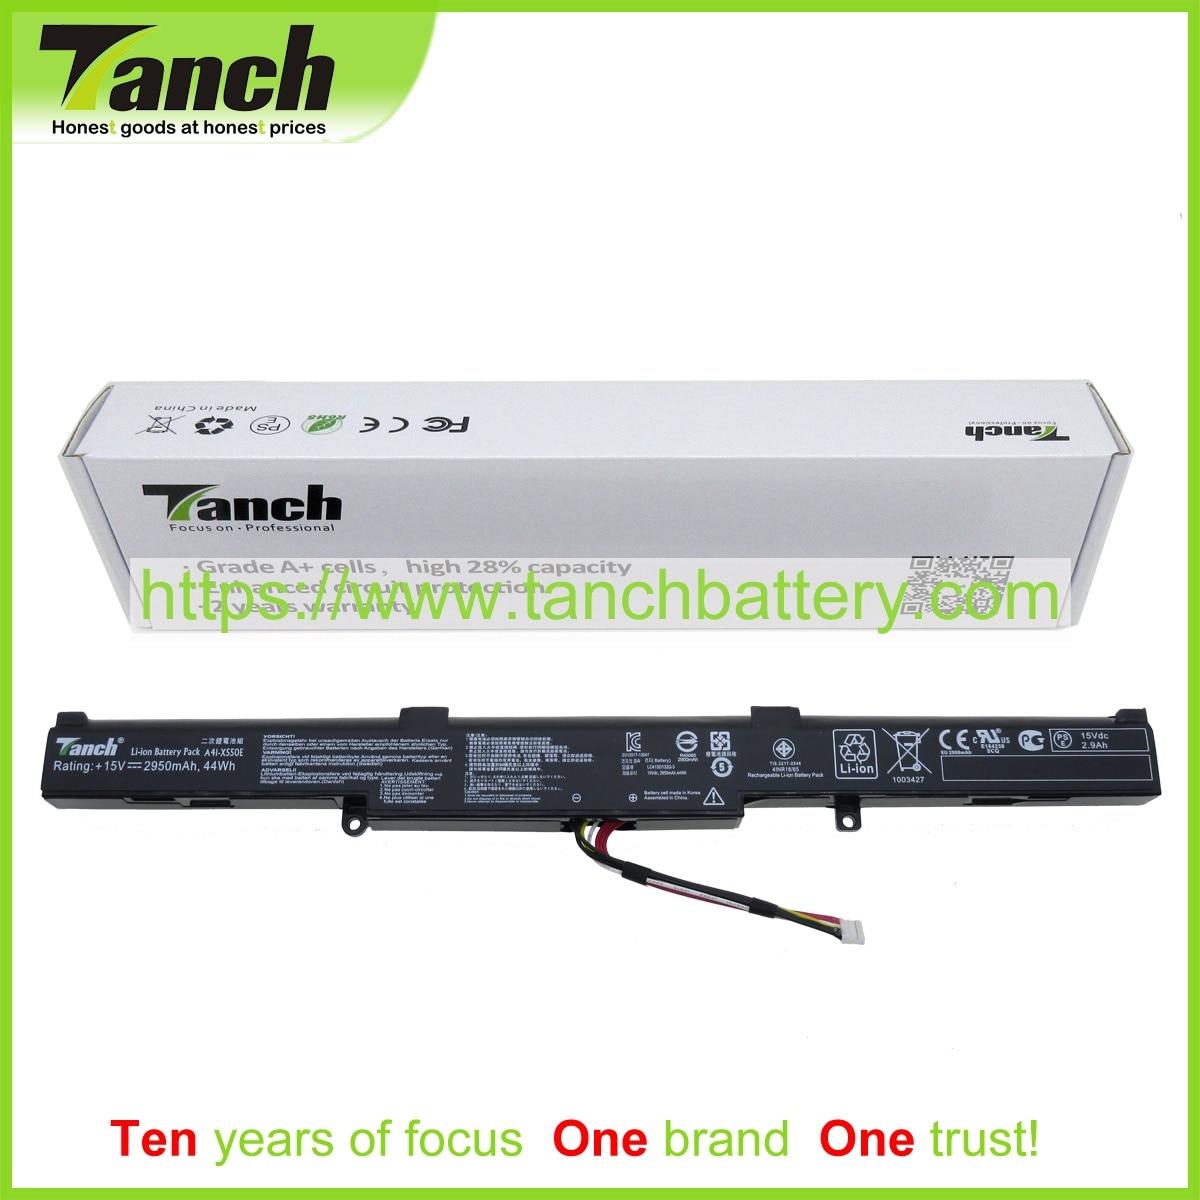 Tanch بطارية كمبيوتر محمول ل ASUS 0B110-00220100 CS-AUX450NB LC41LG130Q-7 A450 X751LB X751SJ F751MD R752MA 15V 4 الخليوي